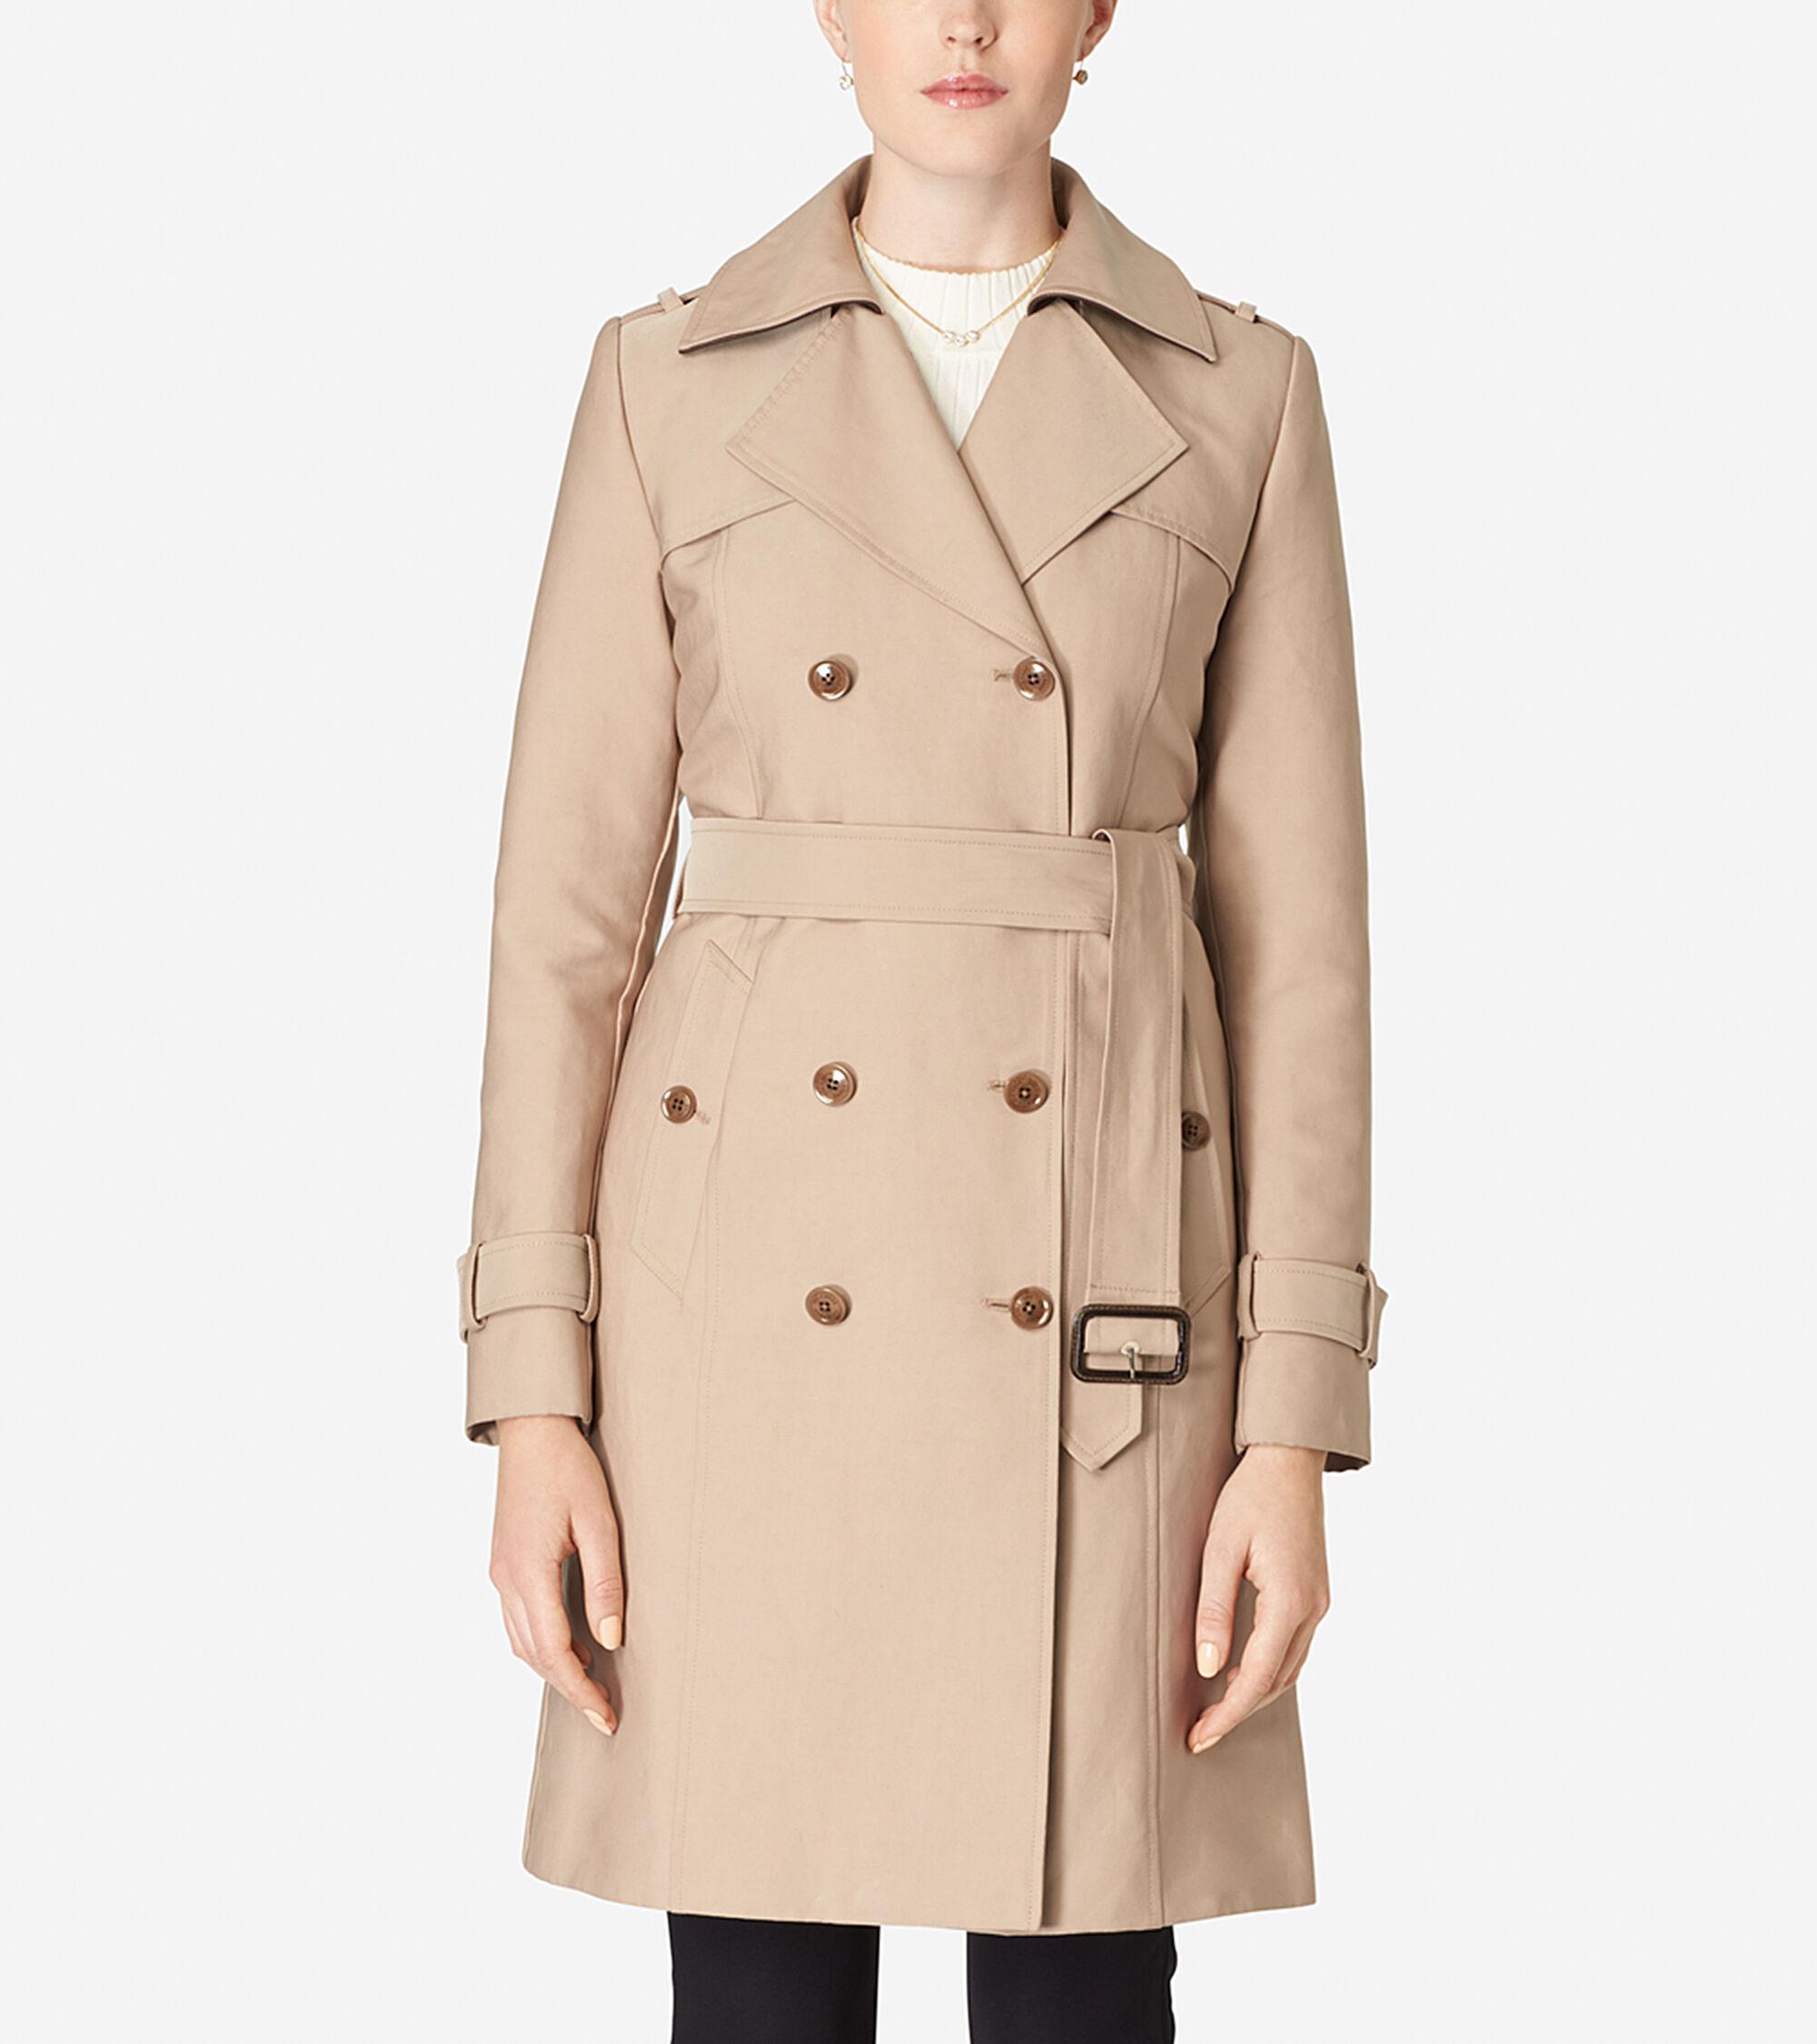 Classics > Tali Lined Trench Coat